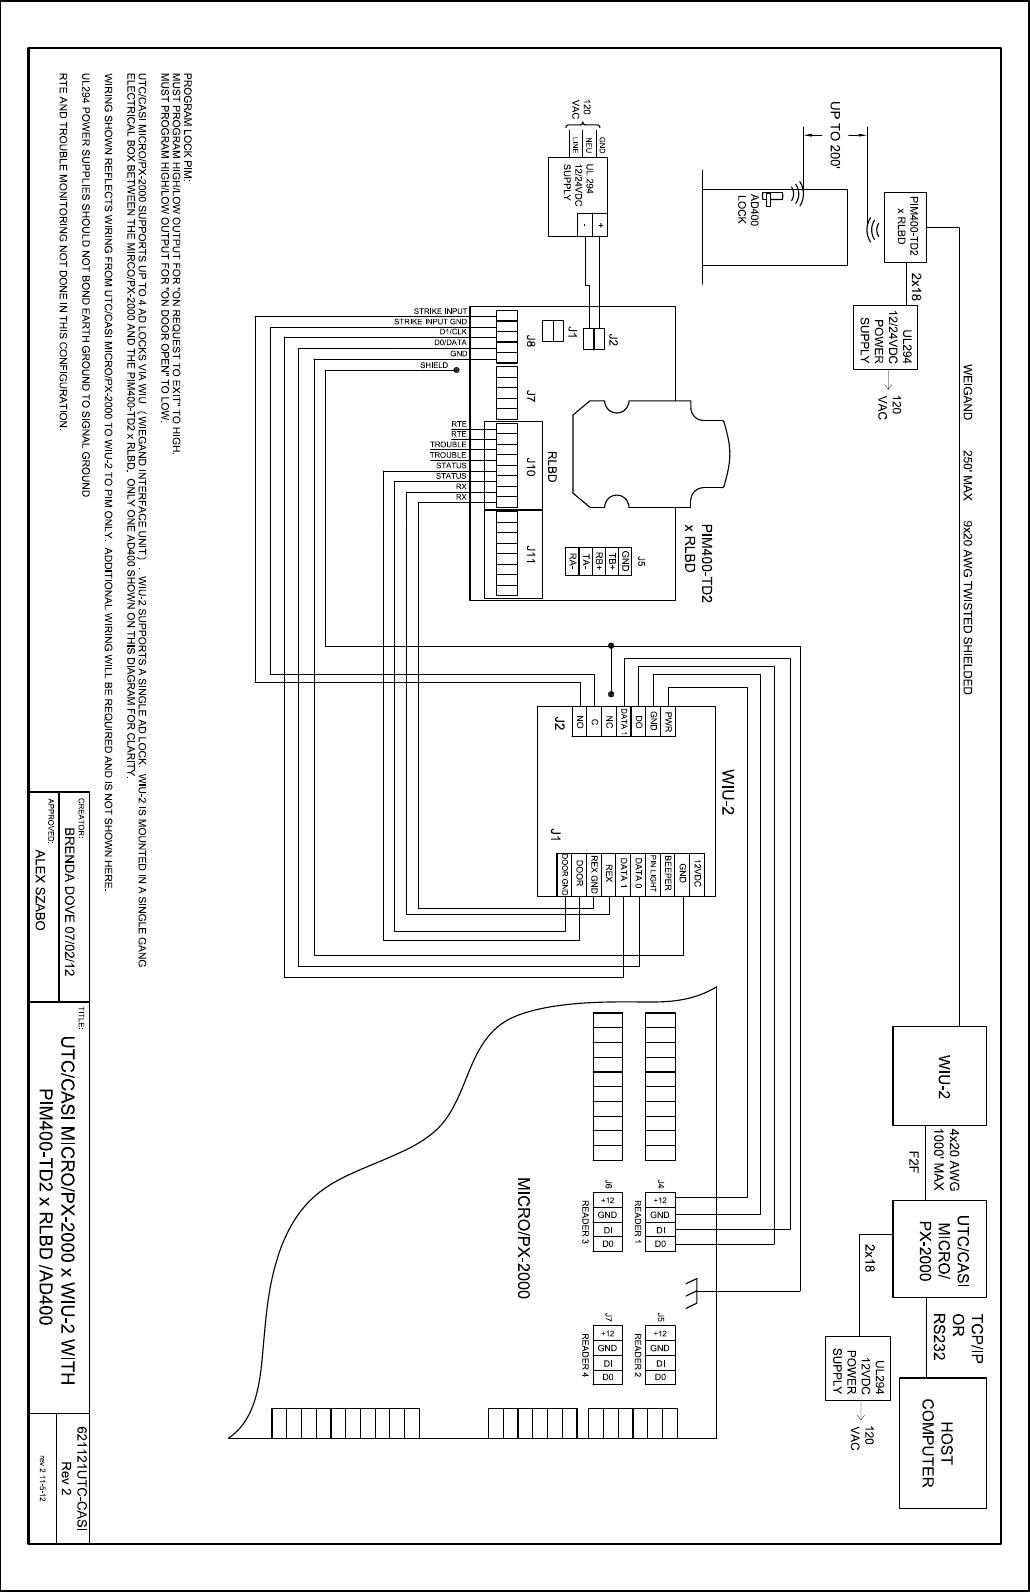 Schlage Electronics C AD400 Wiring Diagram UTC Casi Micro